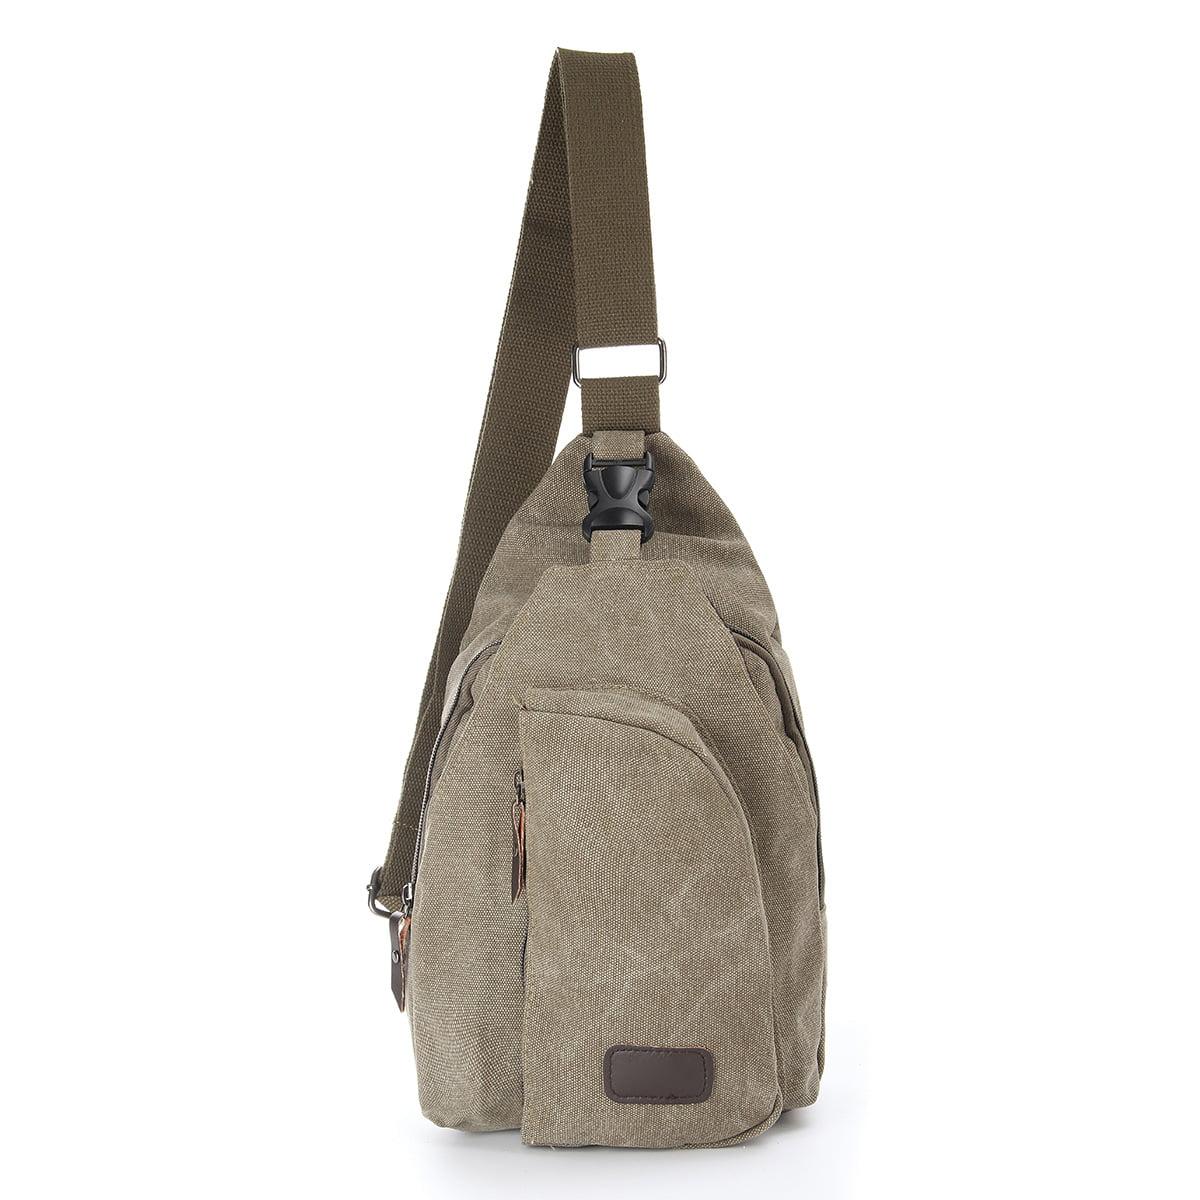 58f5db5d209 Military Vintage Men Canvas Satchel Casual Cross Body Messenger Shoulder  Bag Outdoor Sport Hiking Cross Body Satchel Bag Chest Pack Sling Backpack